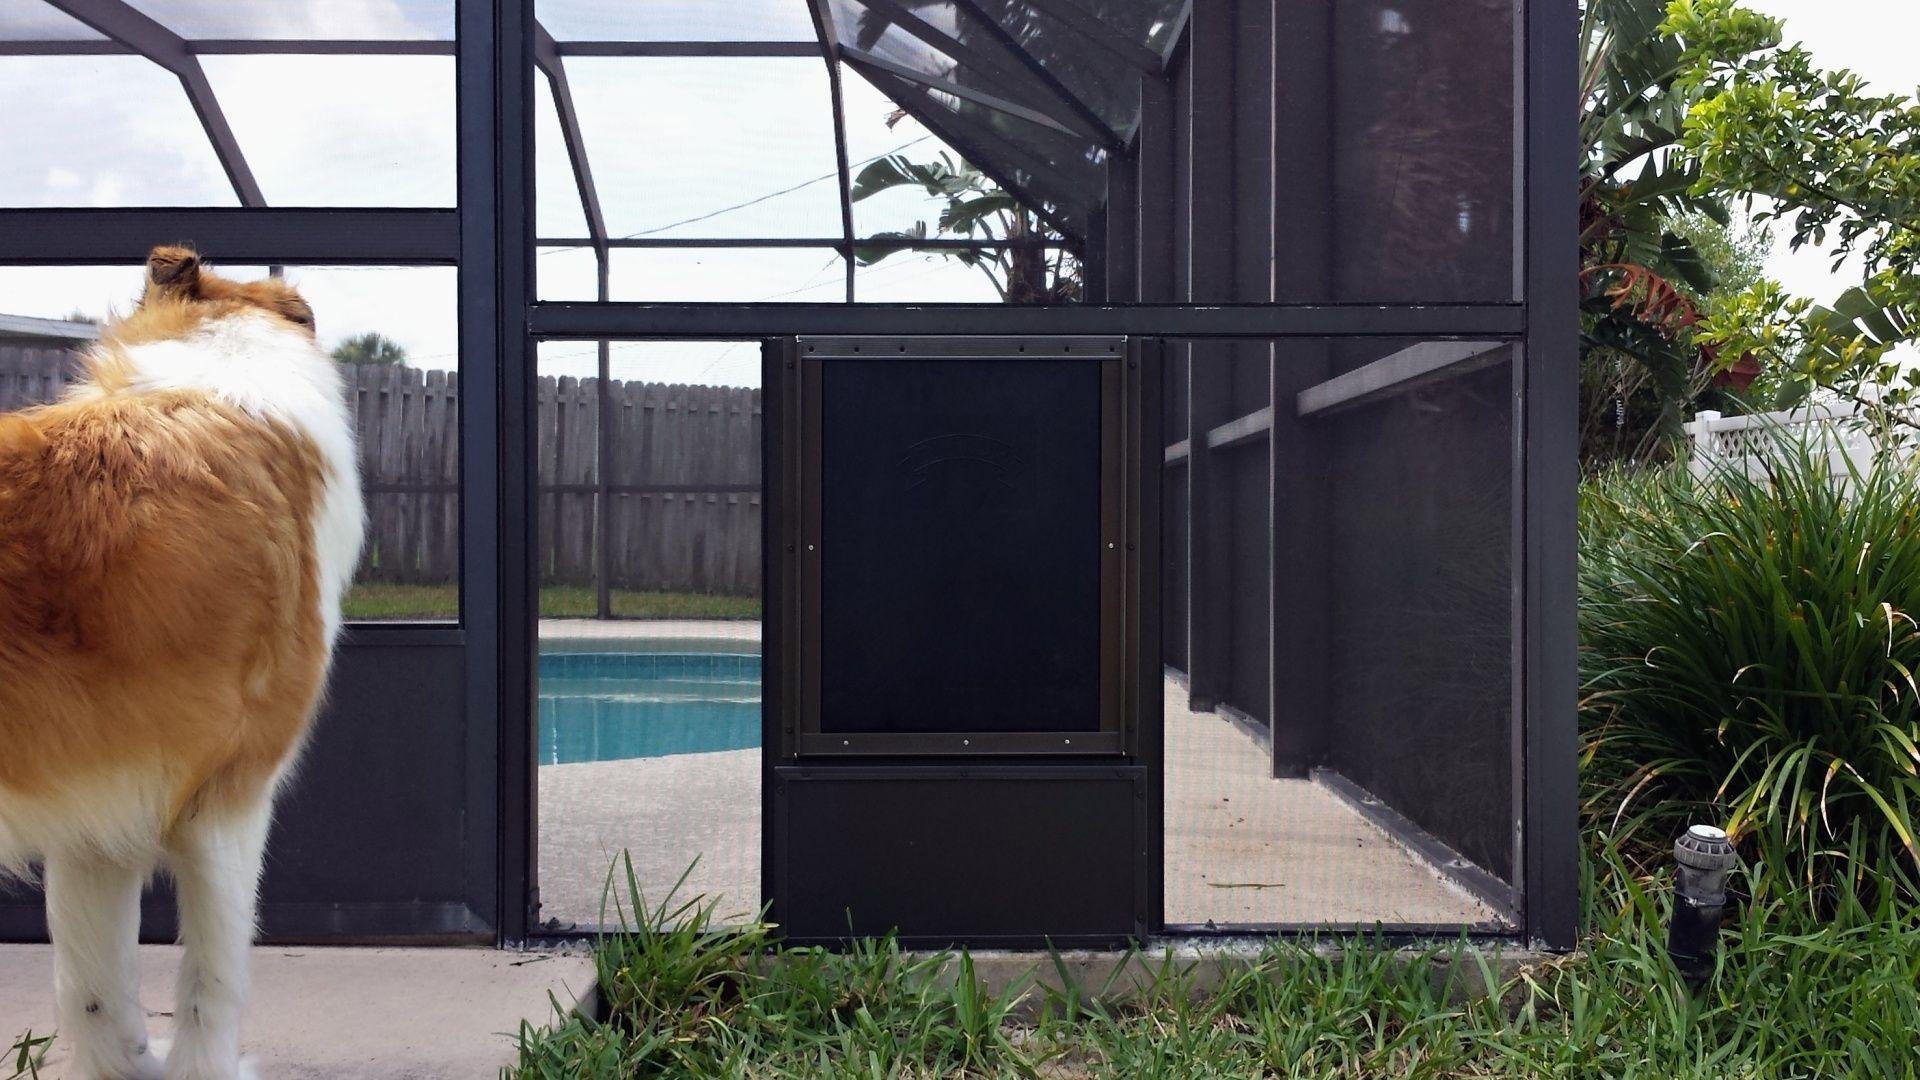 Pool enclosure screen door thefallguyediting pinterest